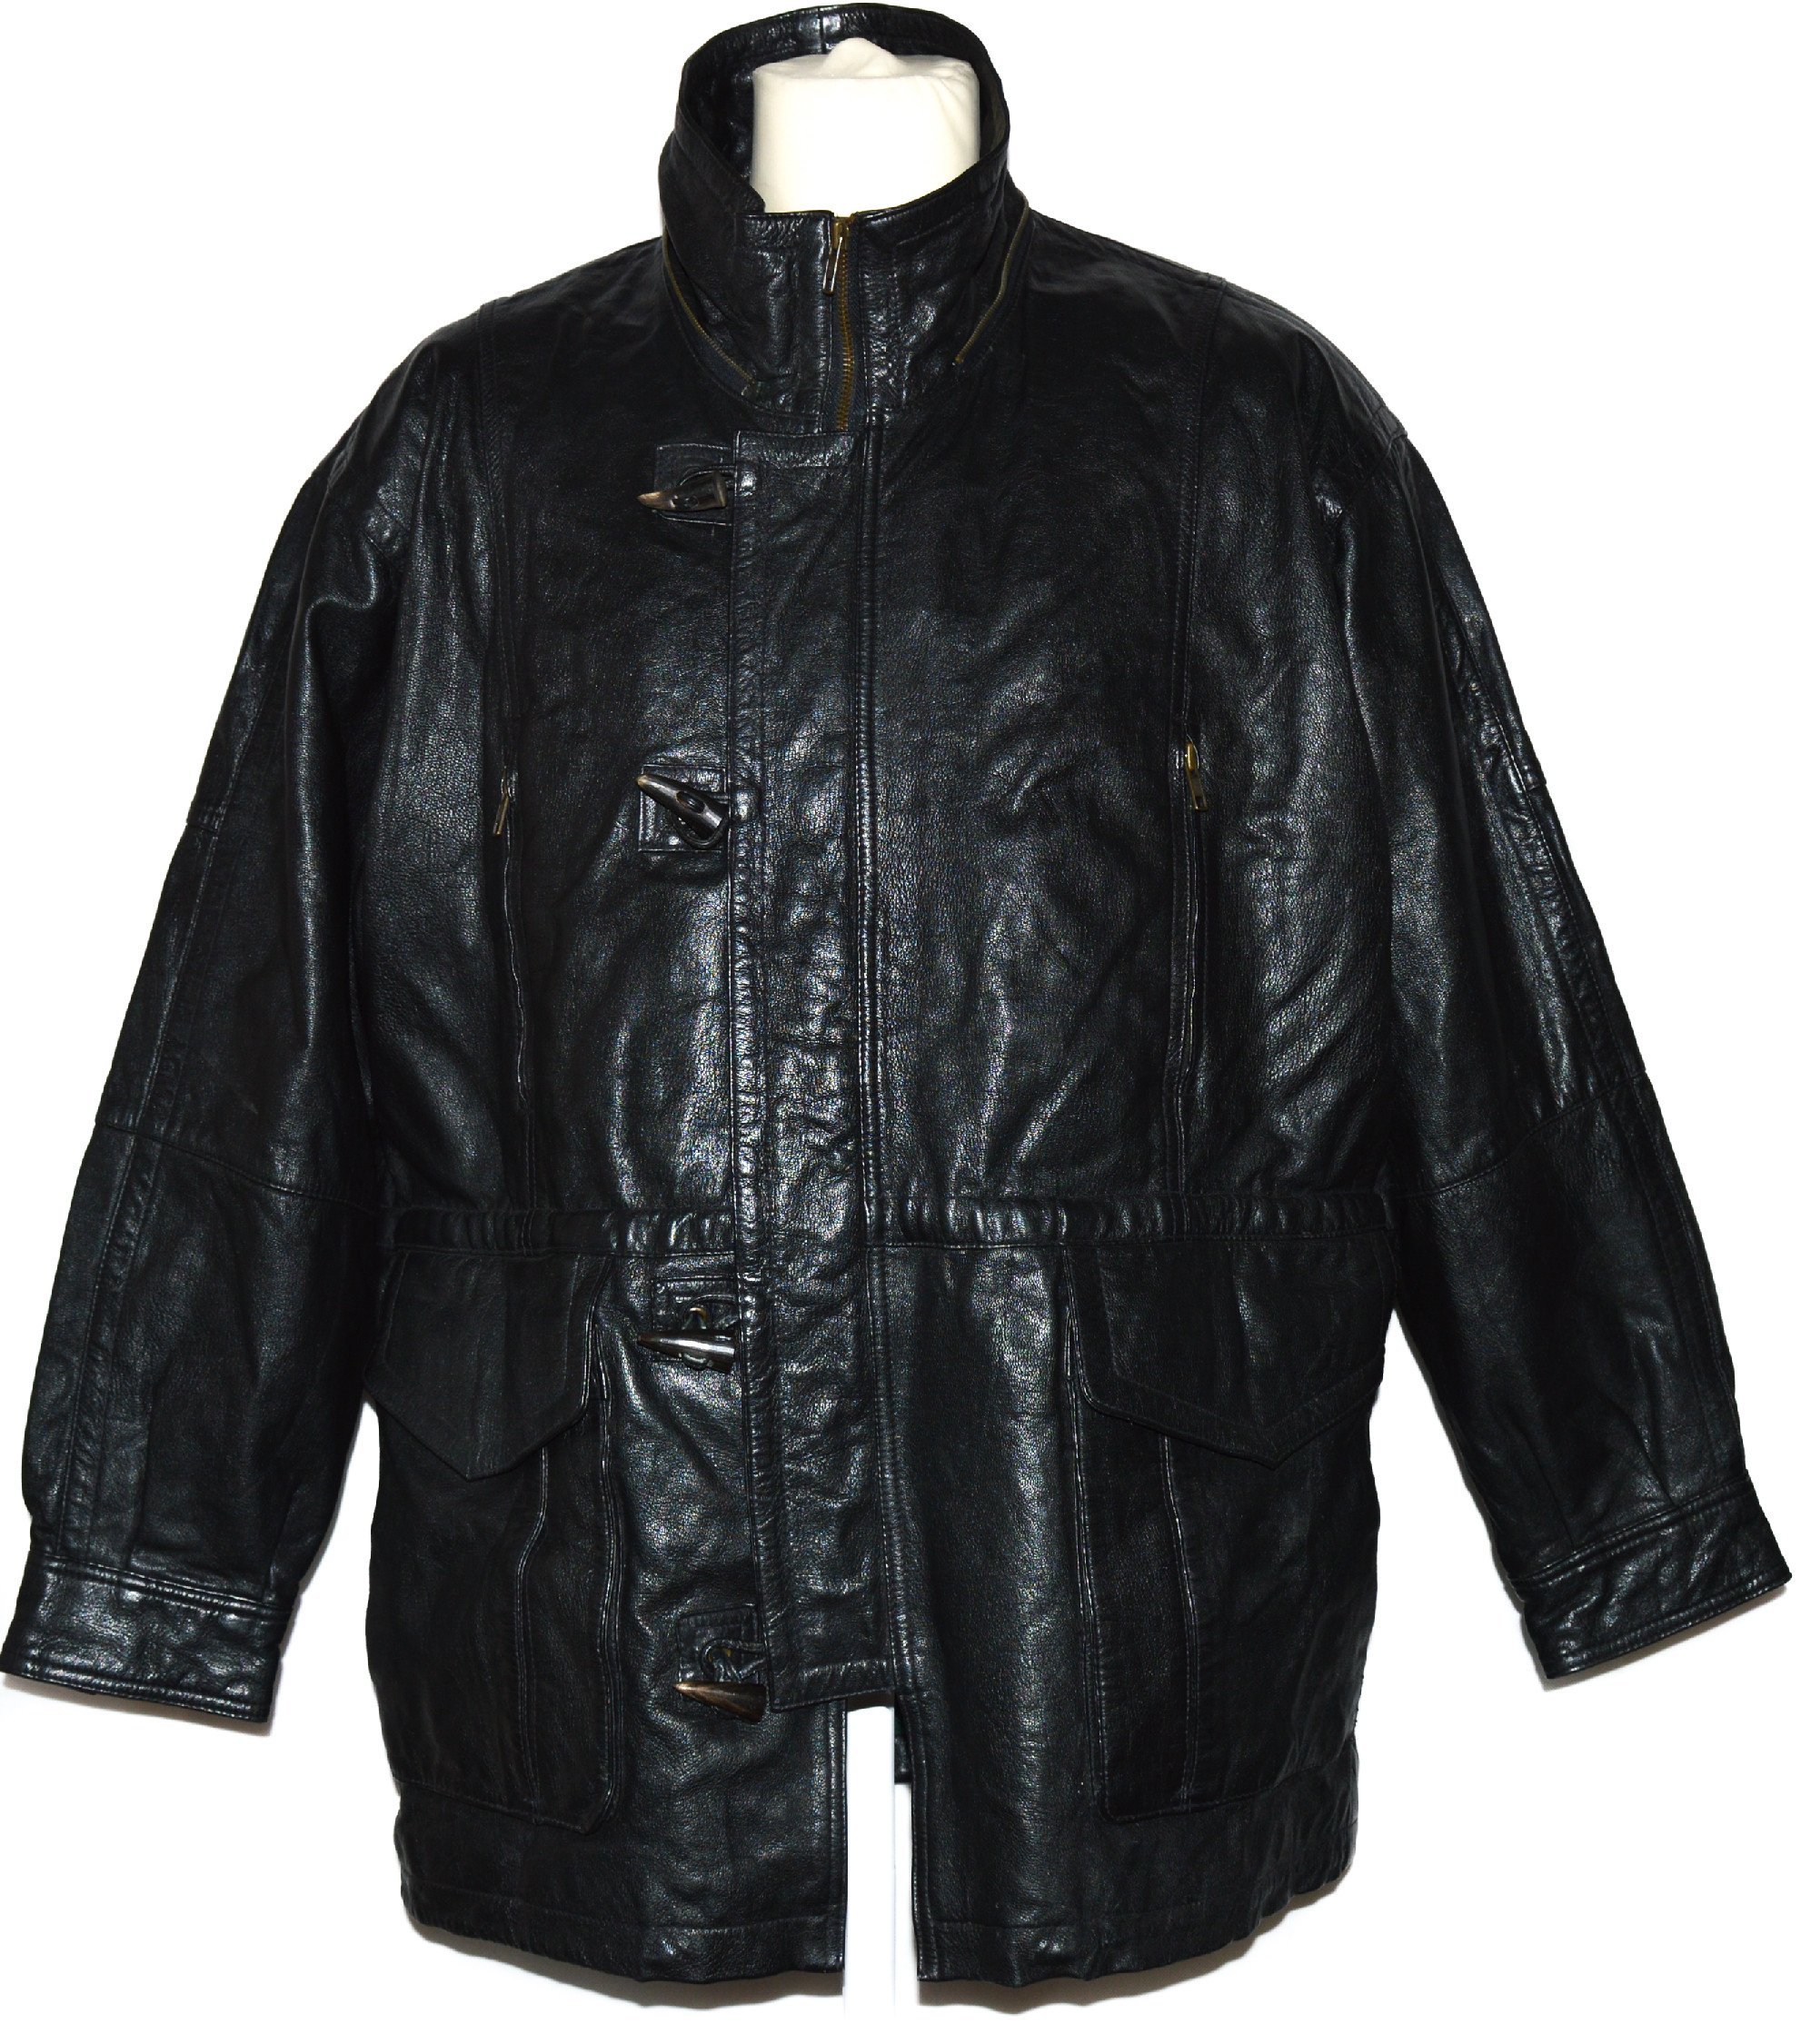 KOŽENÁ pánská černá bunda na zip a vidlice Gapelle XL